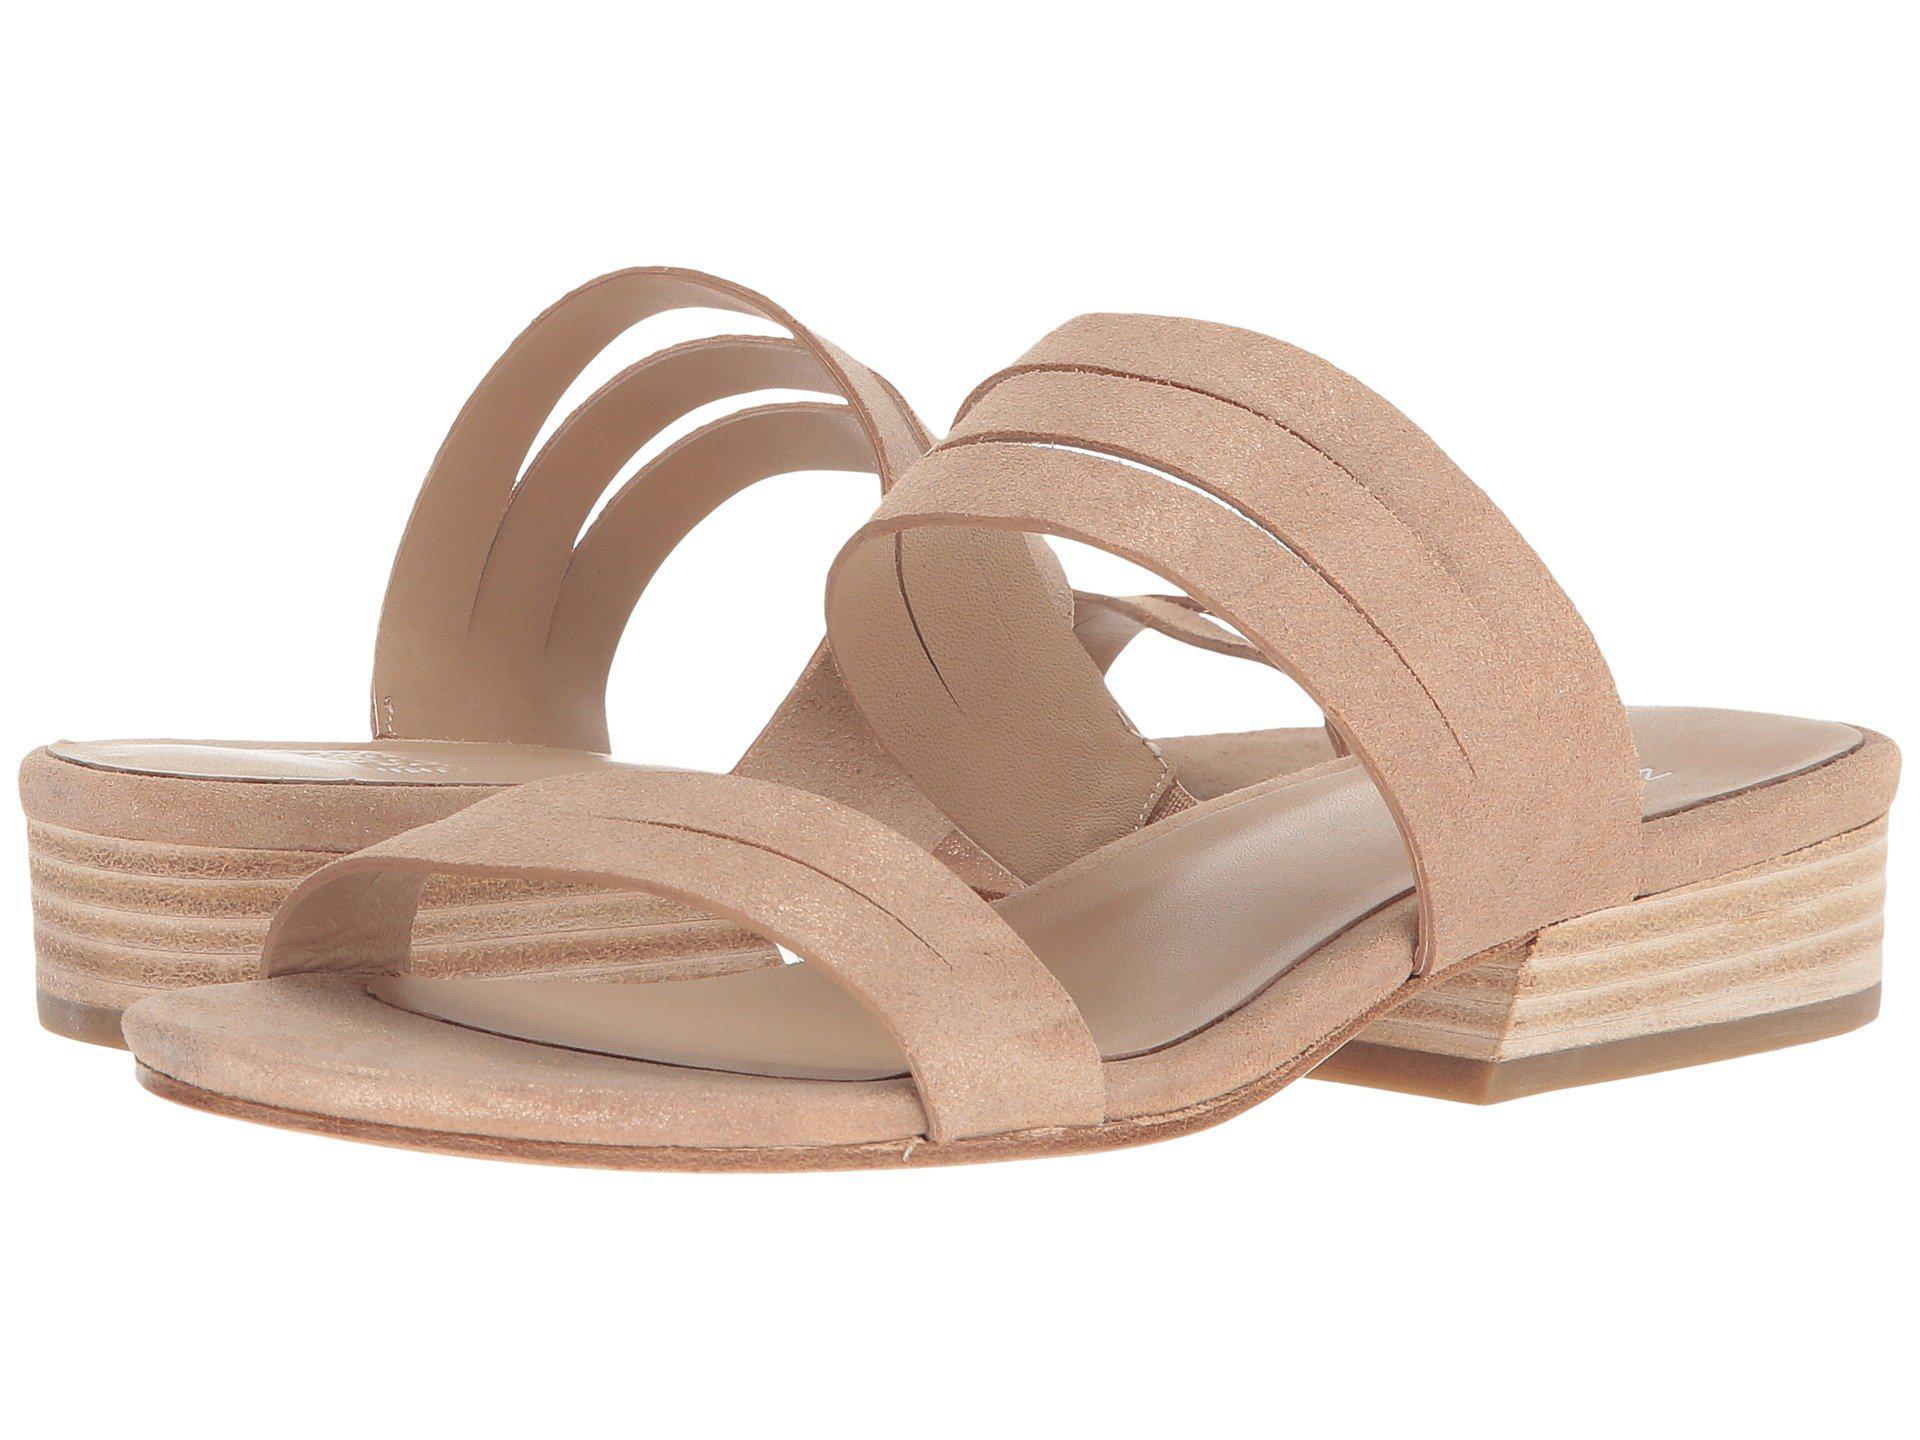 Eileen Fisher Women's Finch Slide Sandal 4Eo2WsQ